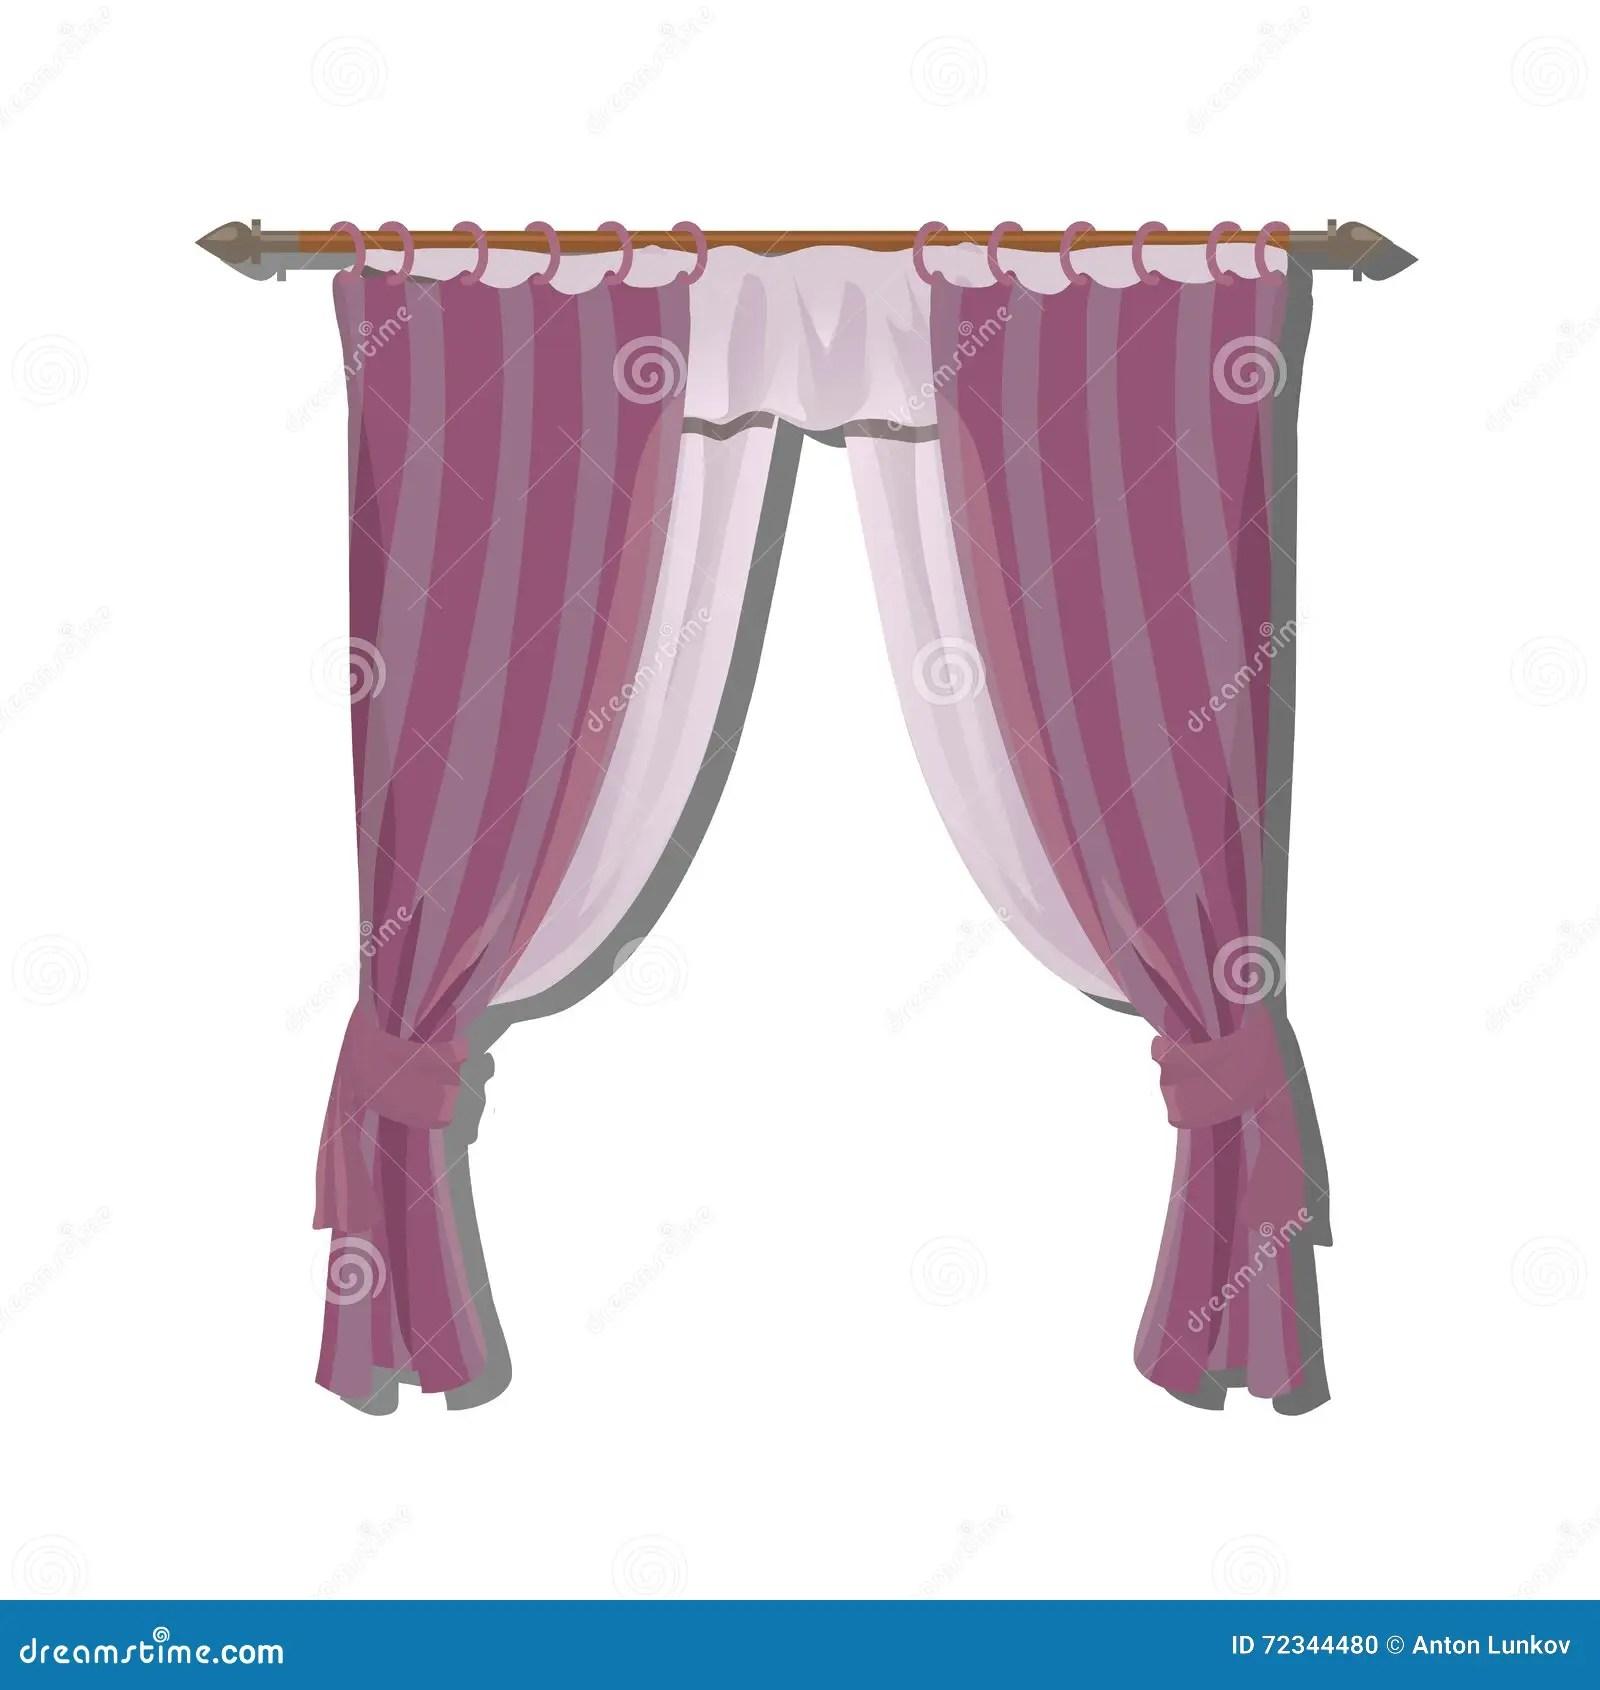 framed prints for kitchens kitchen cabinet kits sale 在壁架的桃红色厨房帷幕 装饰向量例证 插画包括有装饰 要素 框架 在壁架 传染媒介例证 装饰的桃红色厨房帷幕